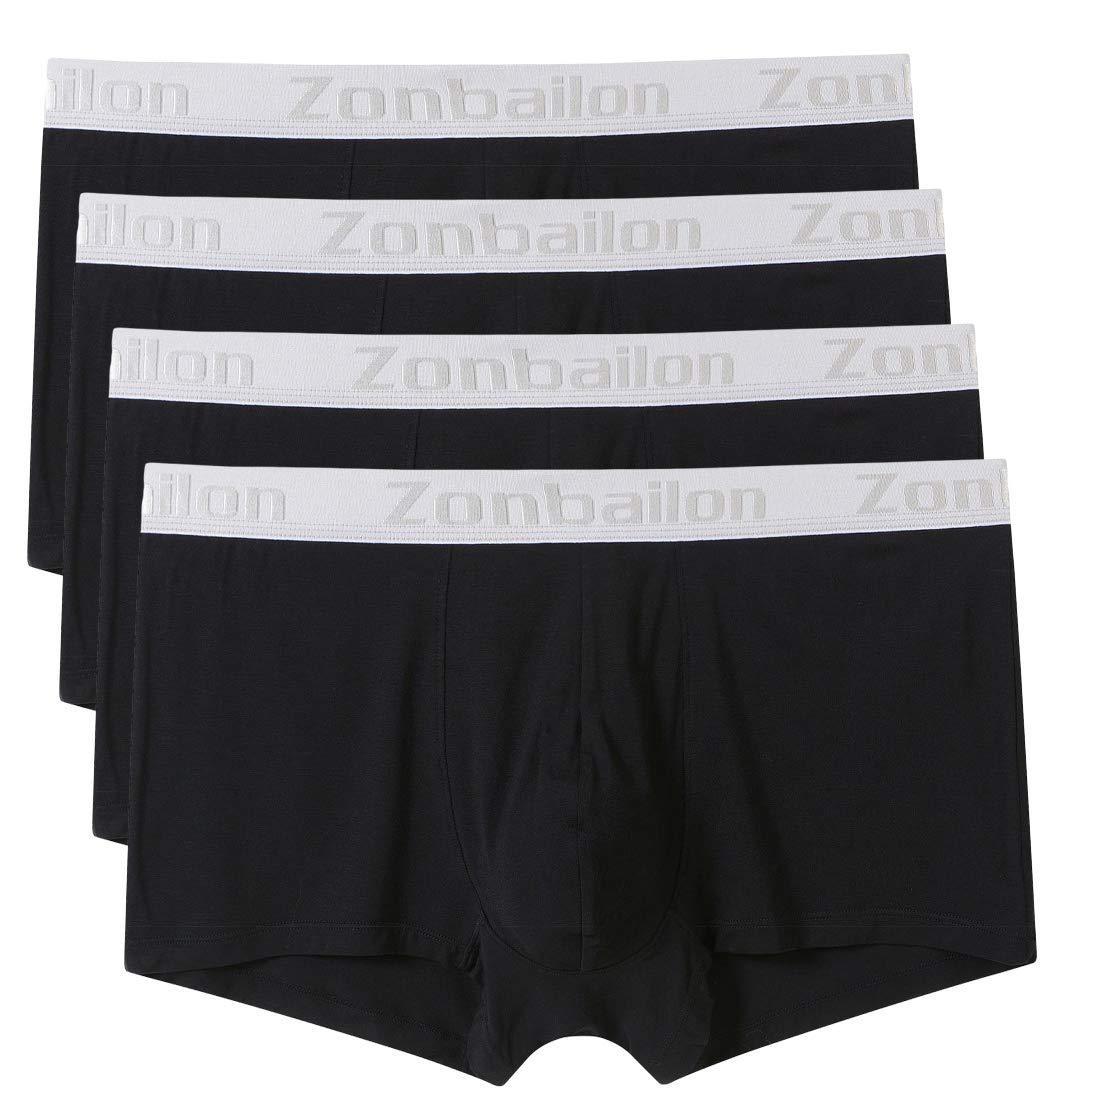 FUNSTYEET Summer Lemon Mens Board Shorts Swim Mesh Lining and Side Pocket